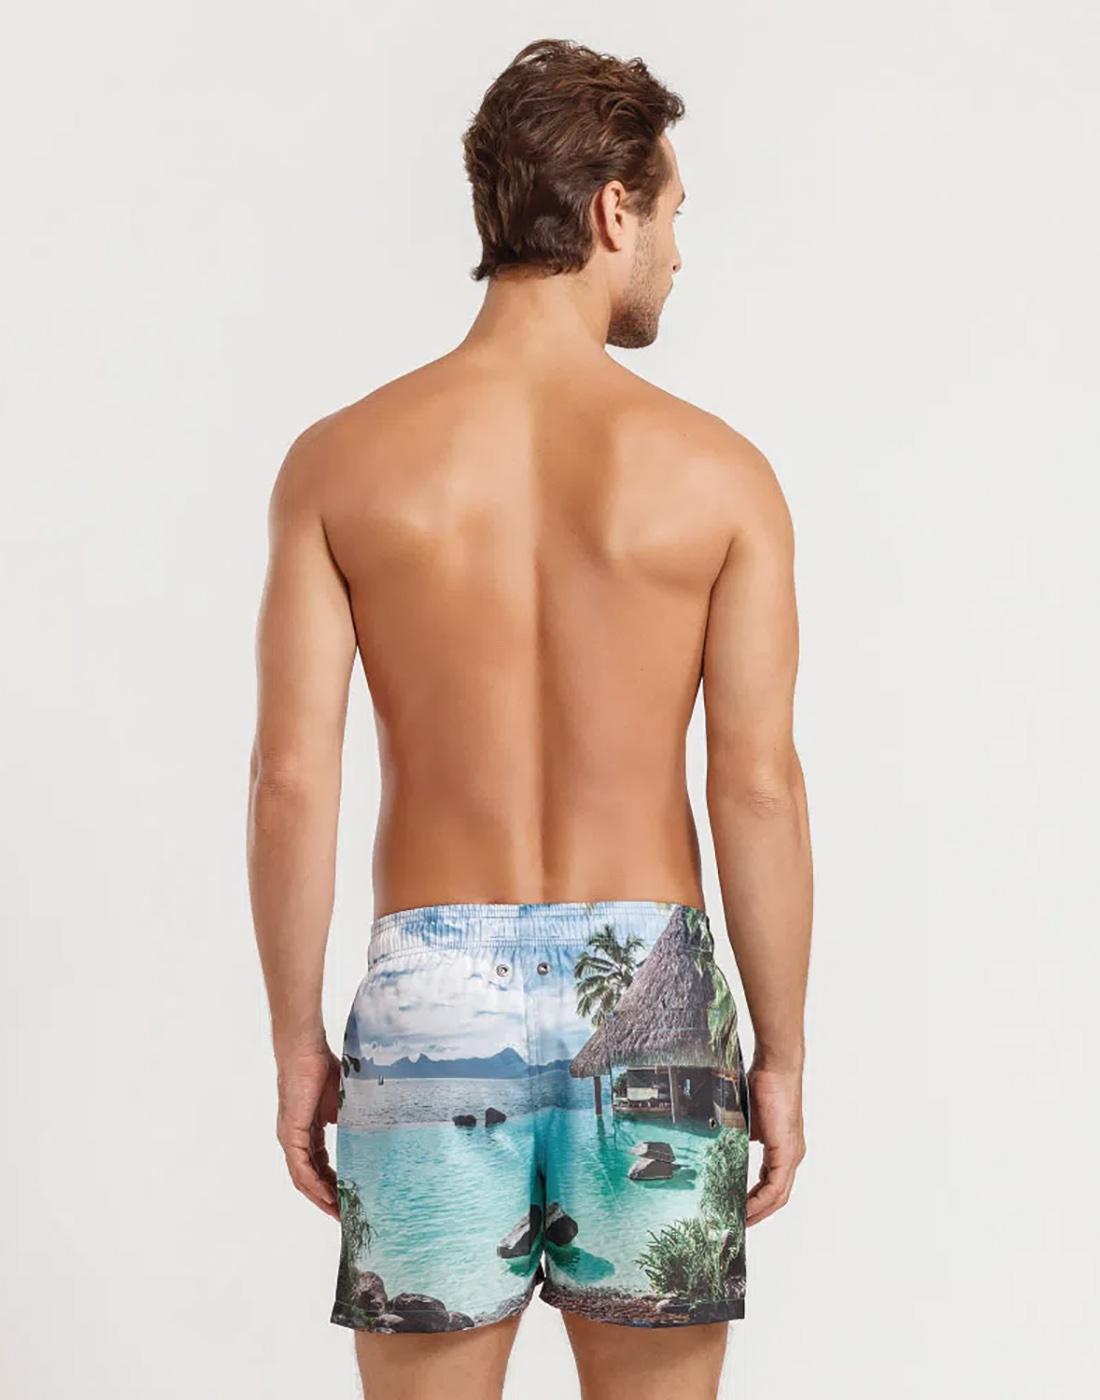 Shorts Curto Estampado FPS 30 Paisagem Masculino Mash